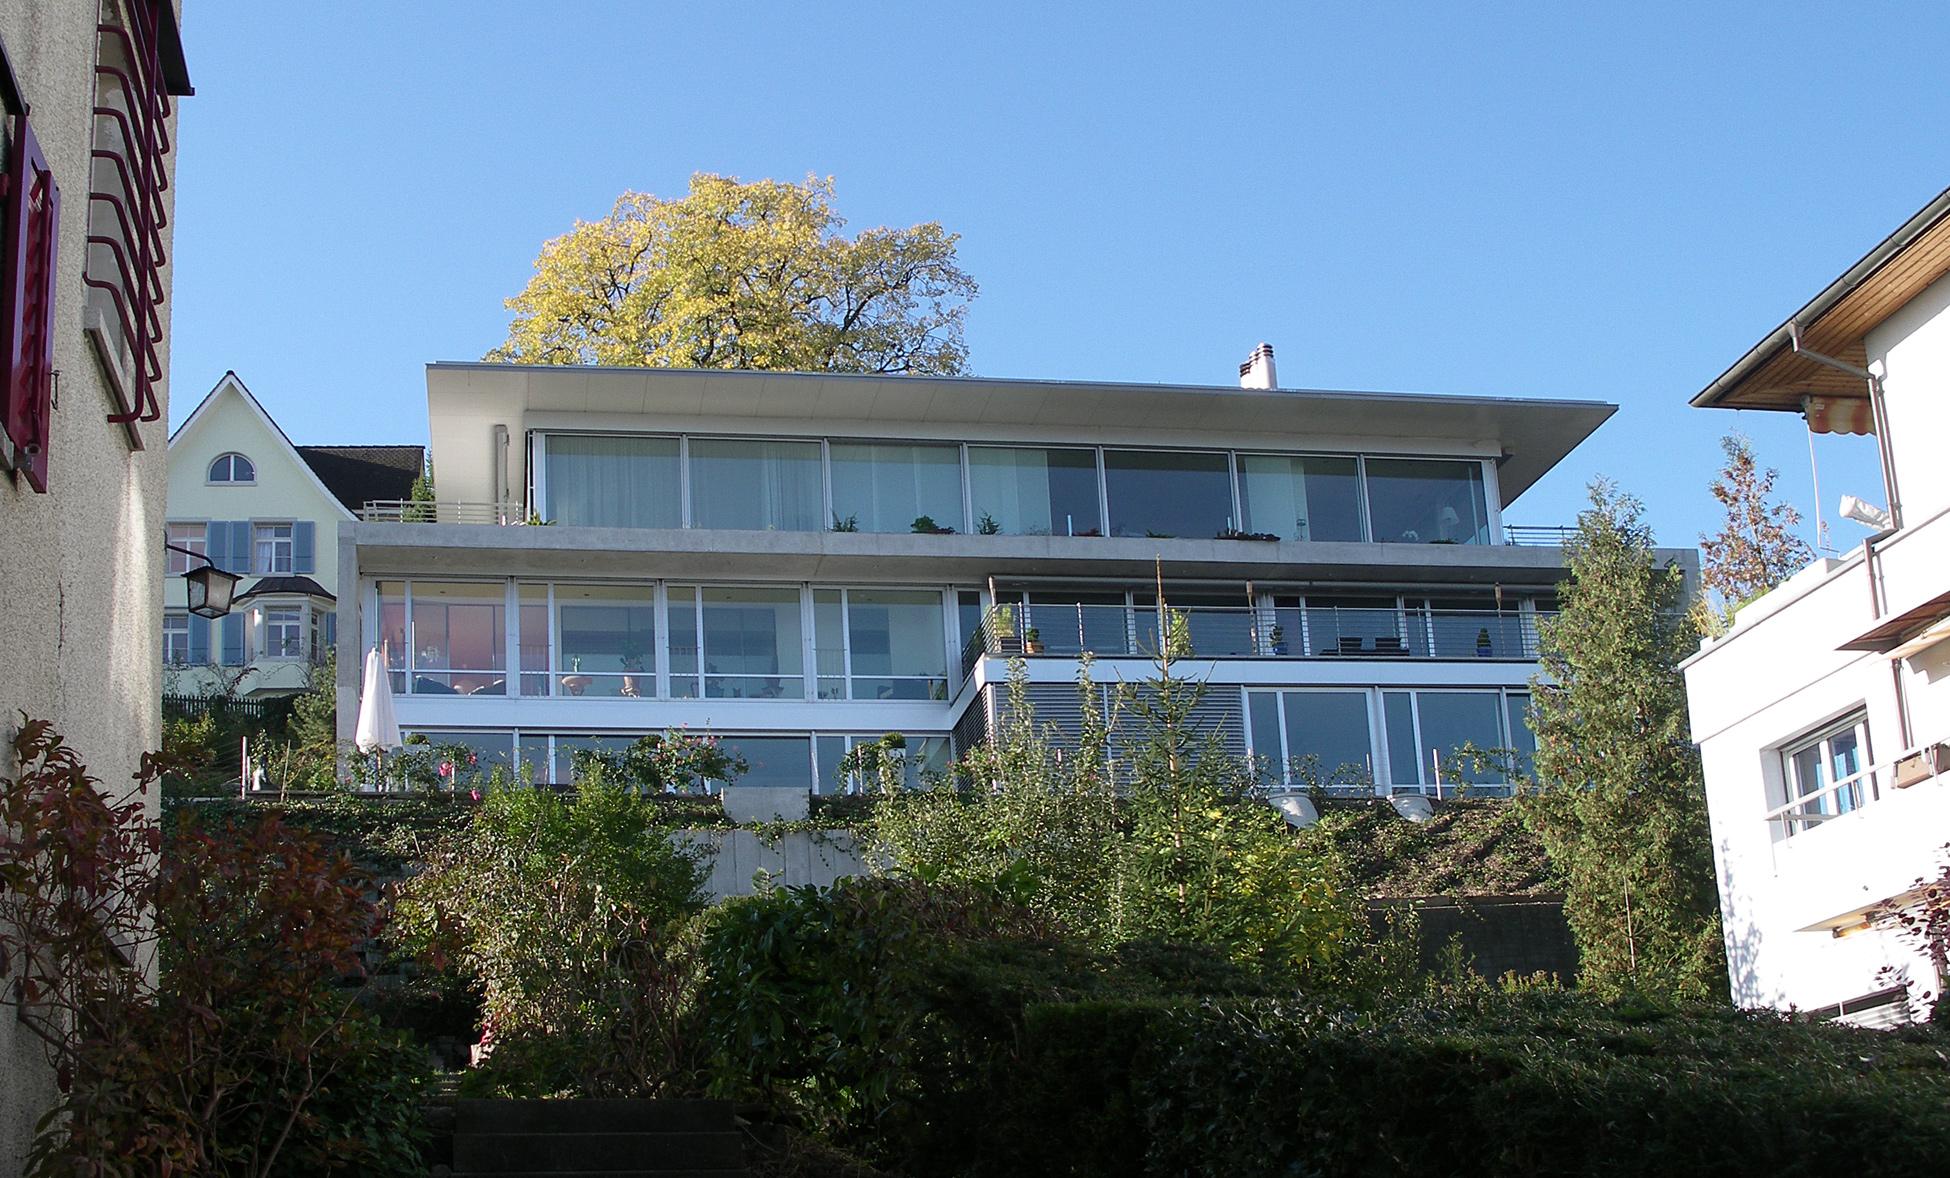 MFH Isisbüelstrasse, Thalwil